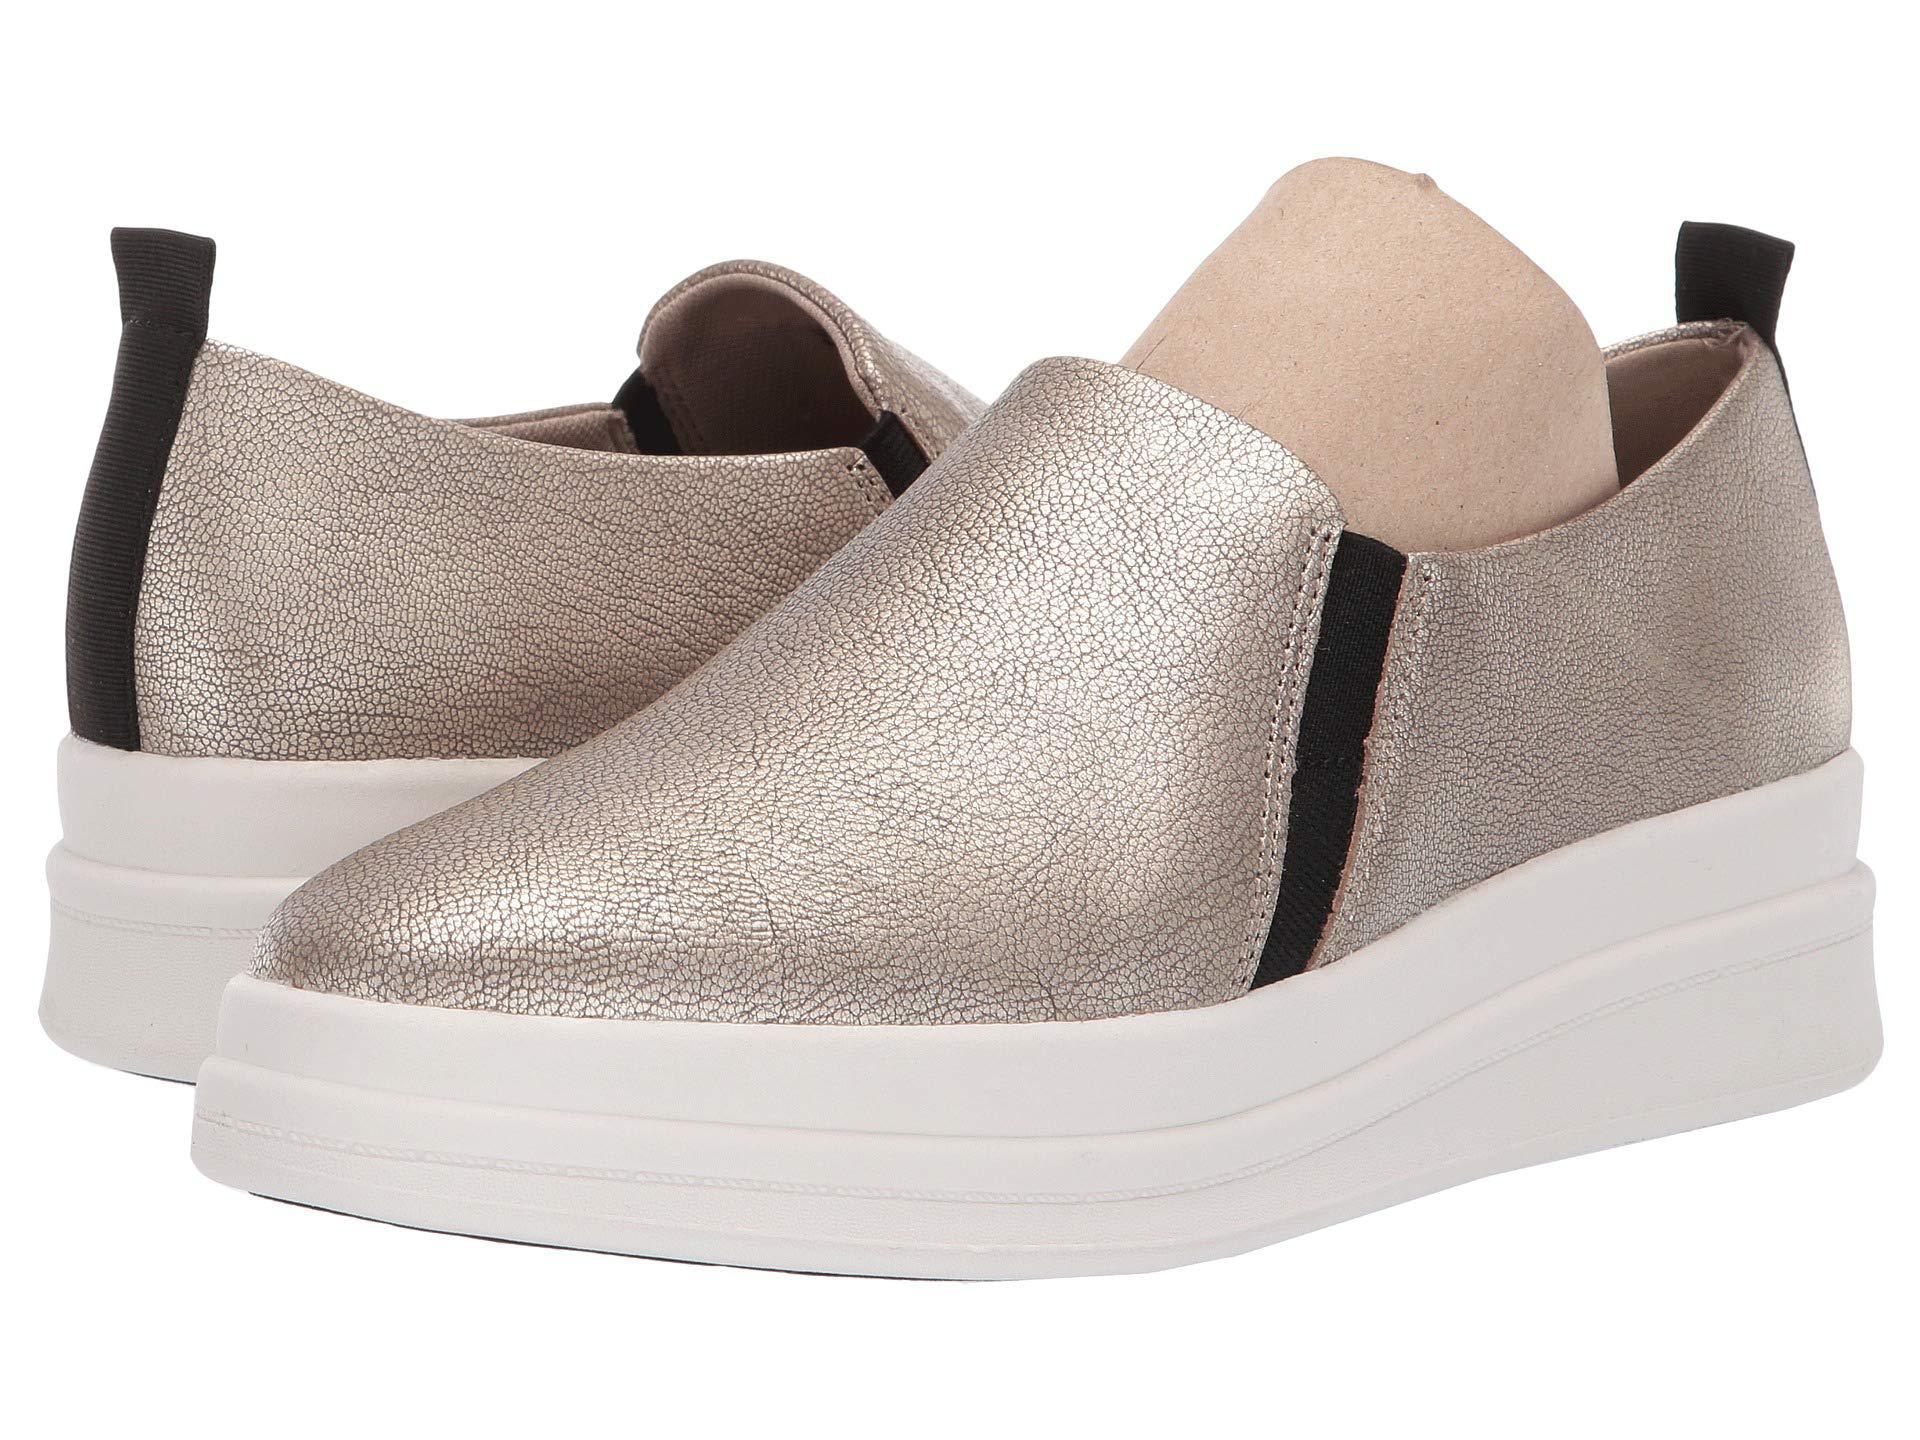 4c7d418847c4 Lyst - Naturalizer Yola (zinc Metallic Leather) Women s Shoes in ...